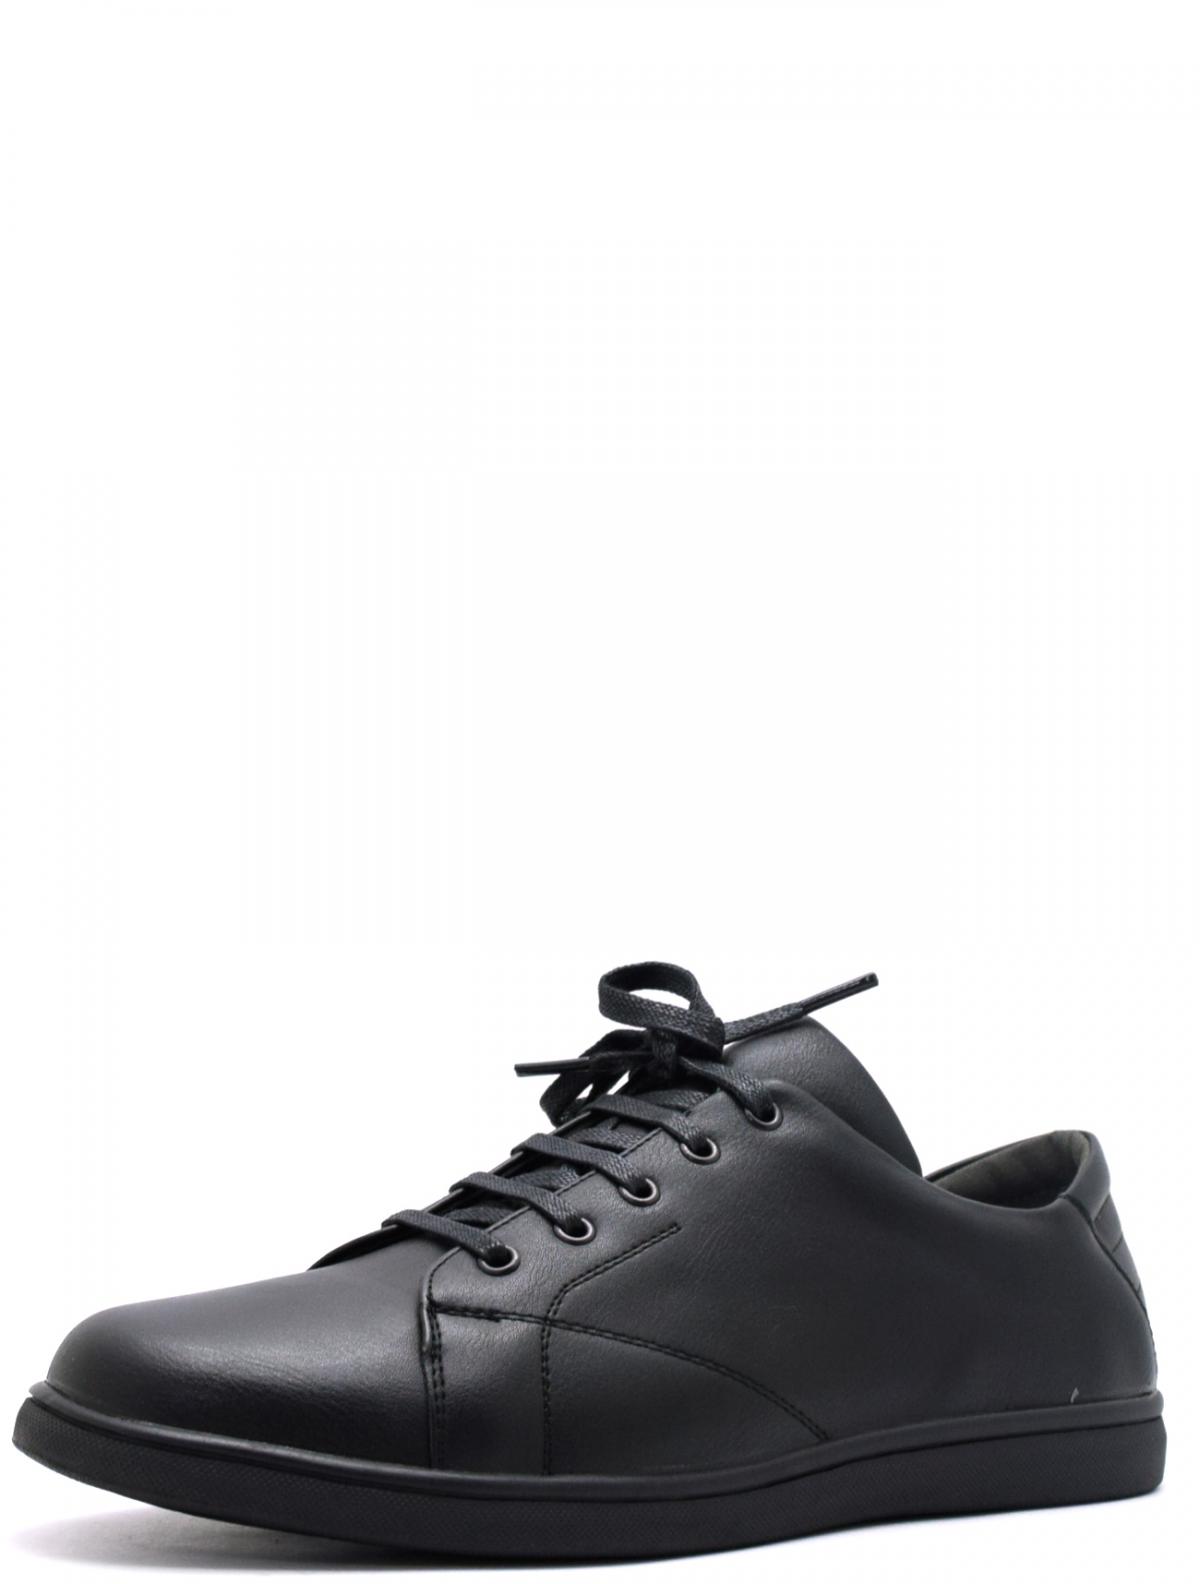 Tesoro 108610/02-01 мужские туфли